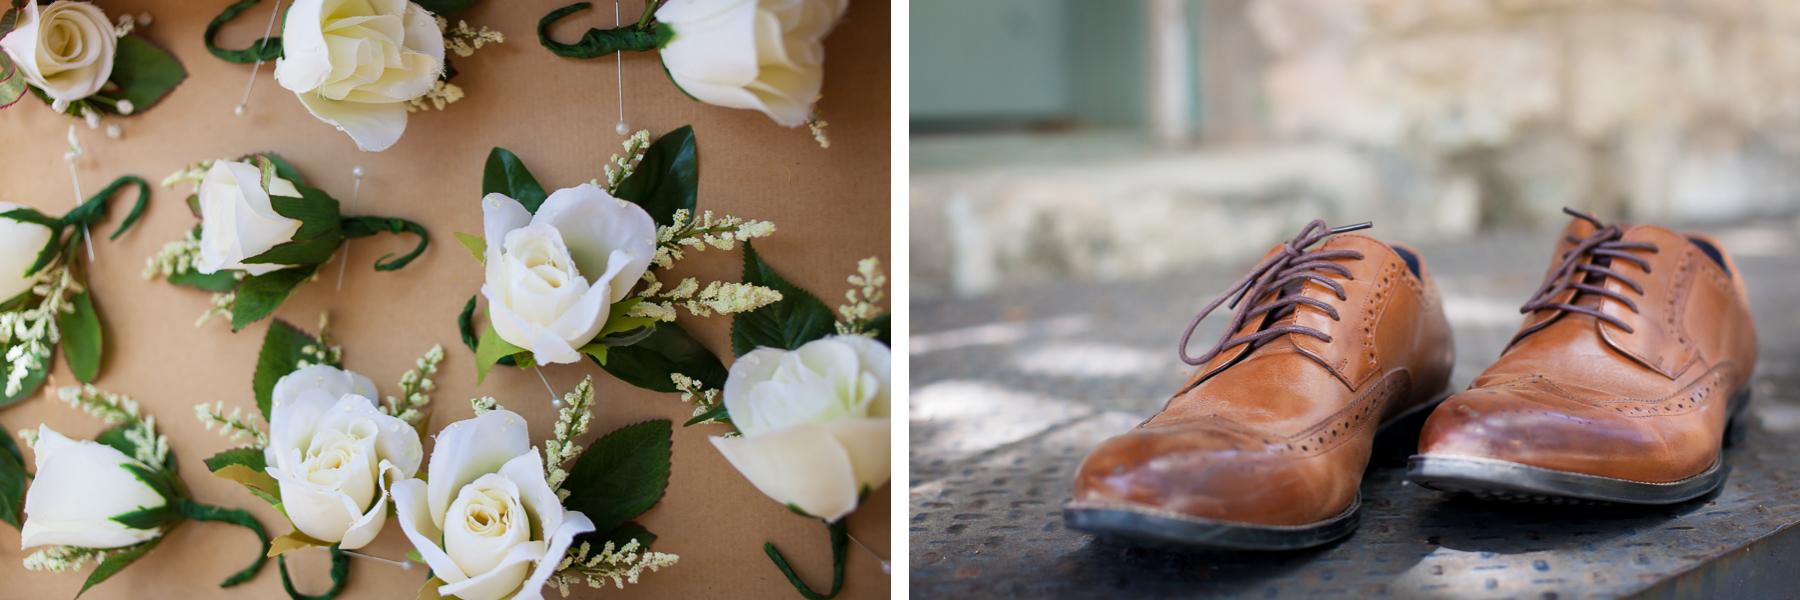 stonehouse-villa-wedding-photos.jpg